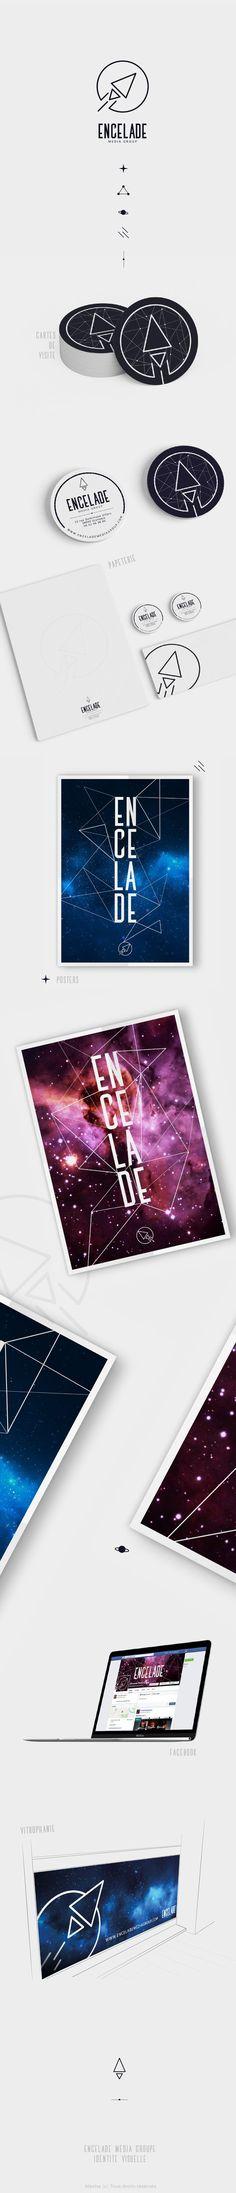 Encelade Media Group   Alextra Visual Identity - Graphisme - Designer - Design - Infographie - identité visuelle - Logo - Logotype - Galaxy - Planète - Cosmos - Fusée